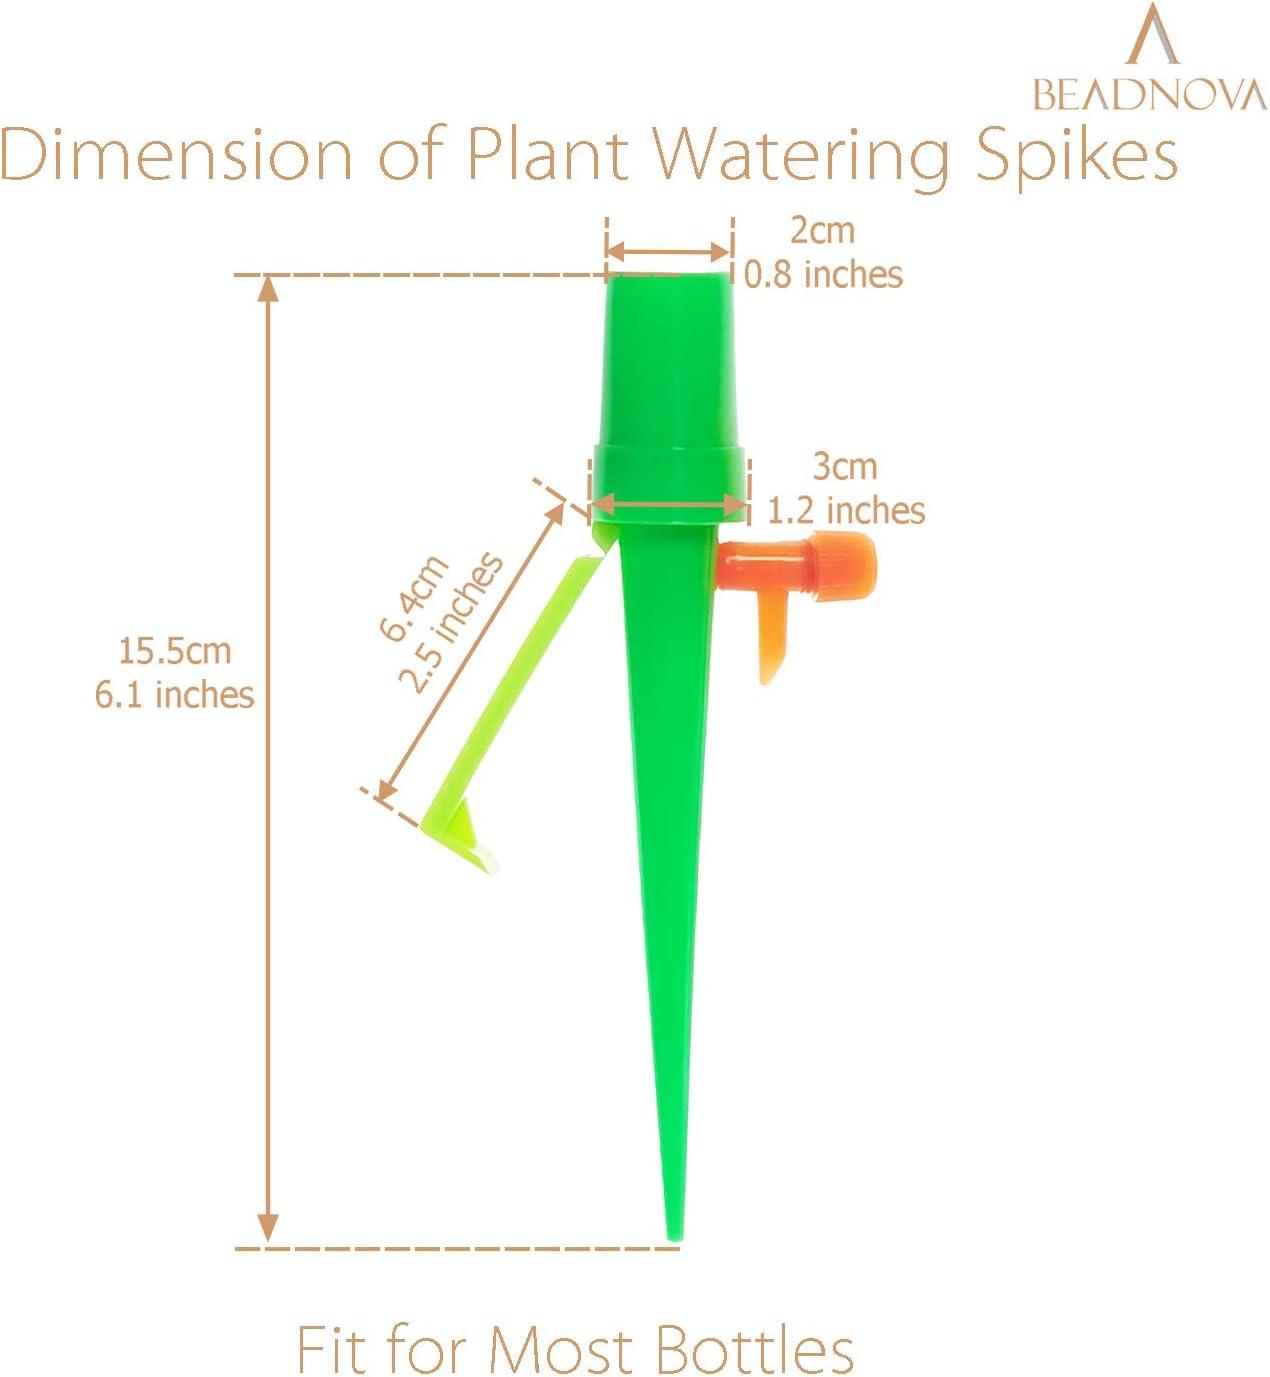 Orange Green, 6pcs BEADNOVA Plant Self Watering Spikes Automatic Irrigation Equipment Adjustable Self Watering Spikes for Plants with Slow Release Control Valve